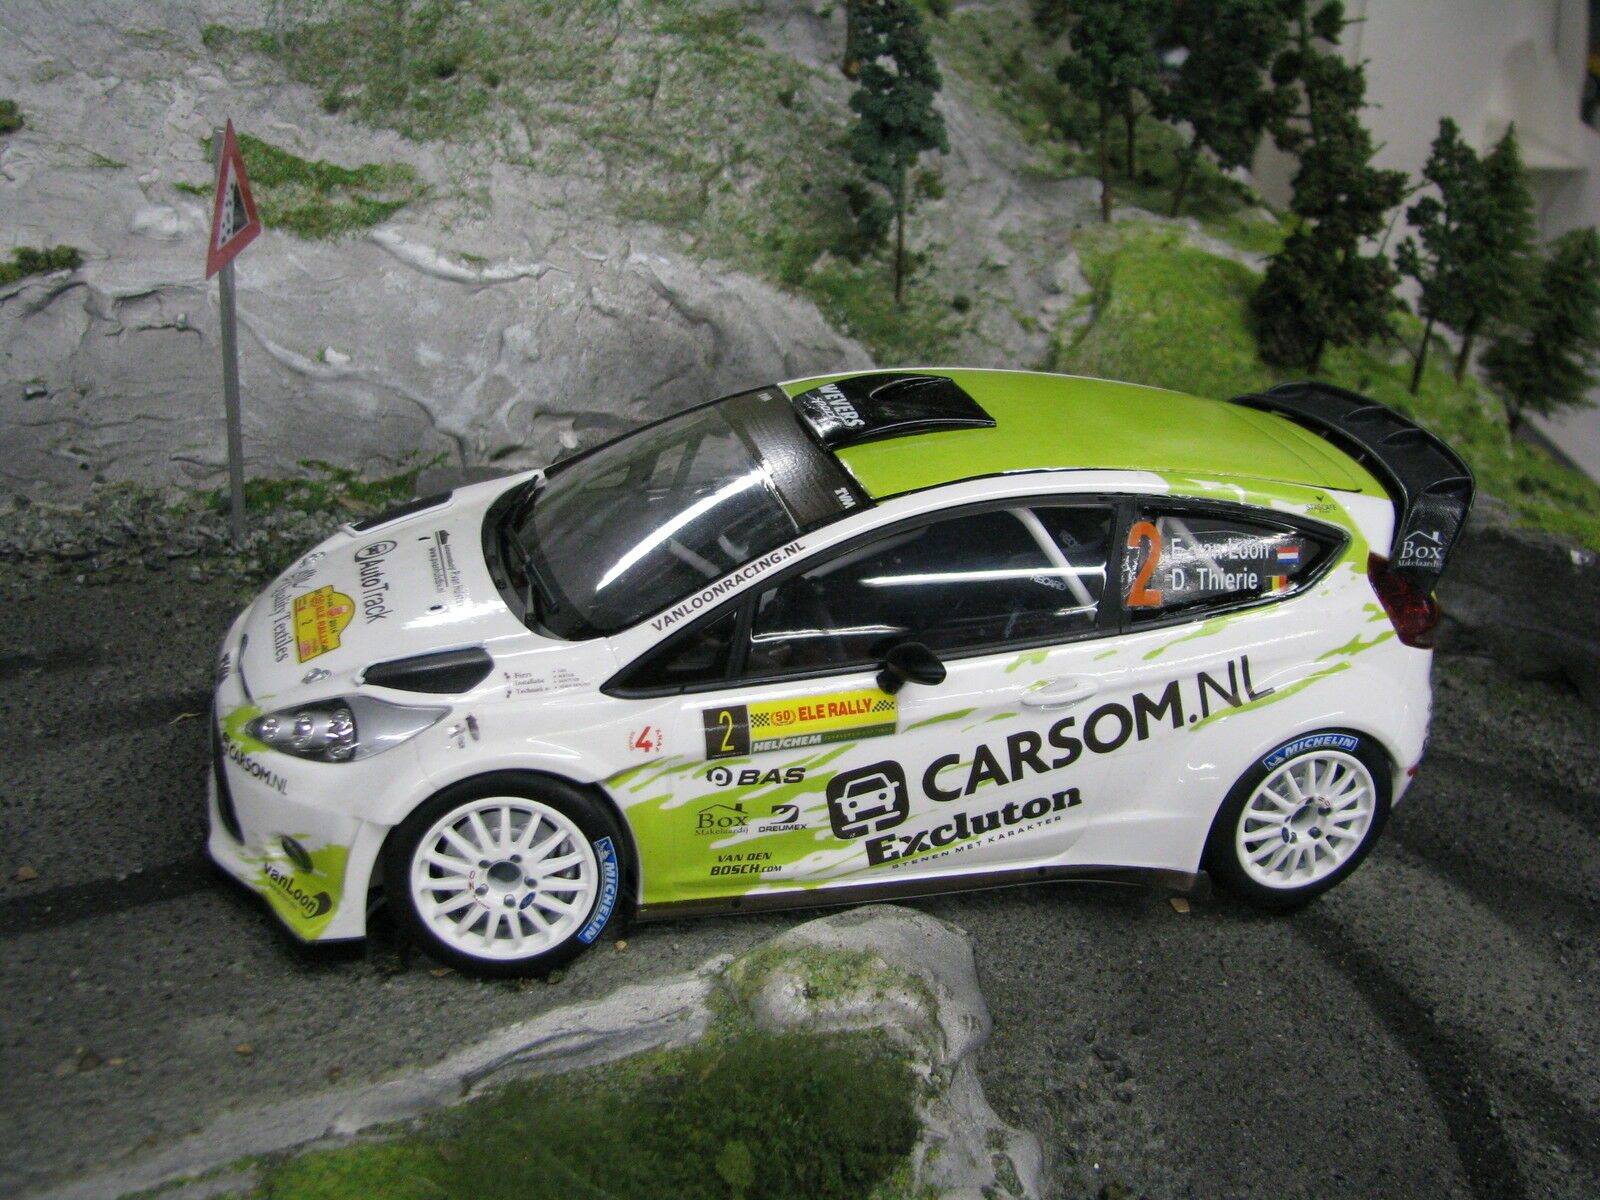 Minichamps Ford Fiesta RS WRC 2014 1:18  2 van Loon / Thierie  MCC